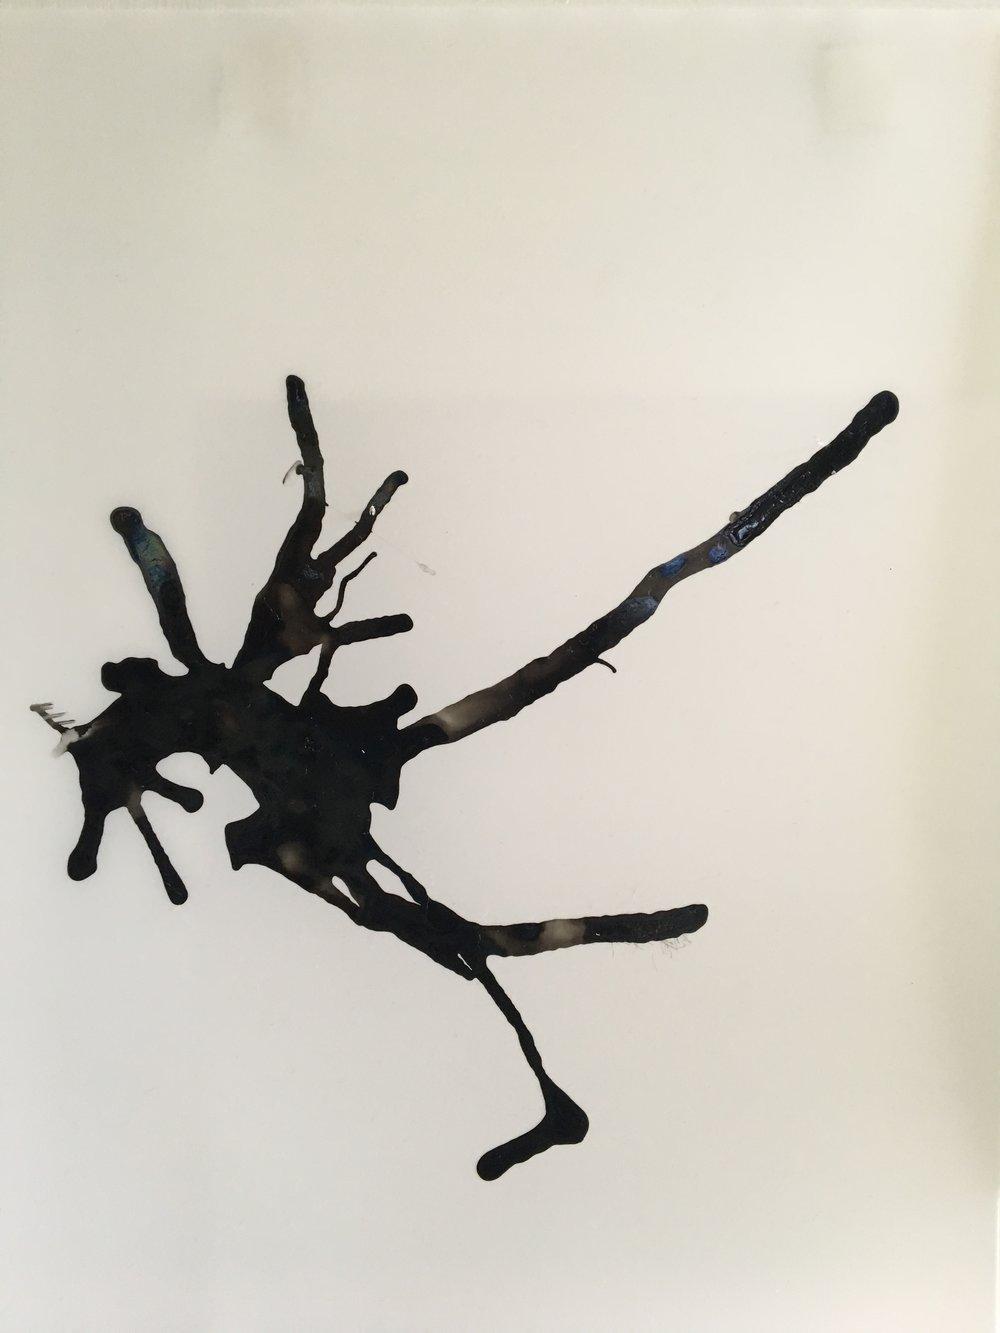 "Petropuru '16, 2017  11"" x 17"", Ink on paper  ©kellycorrell"